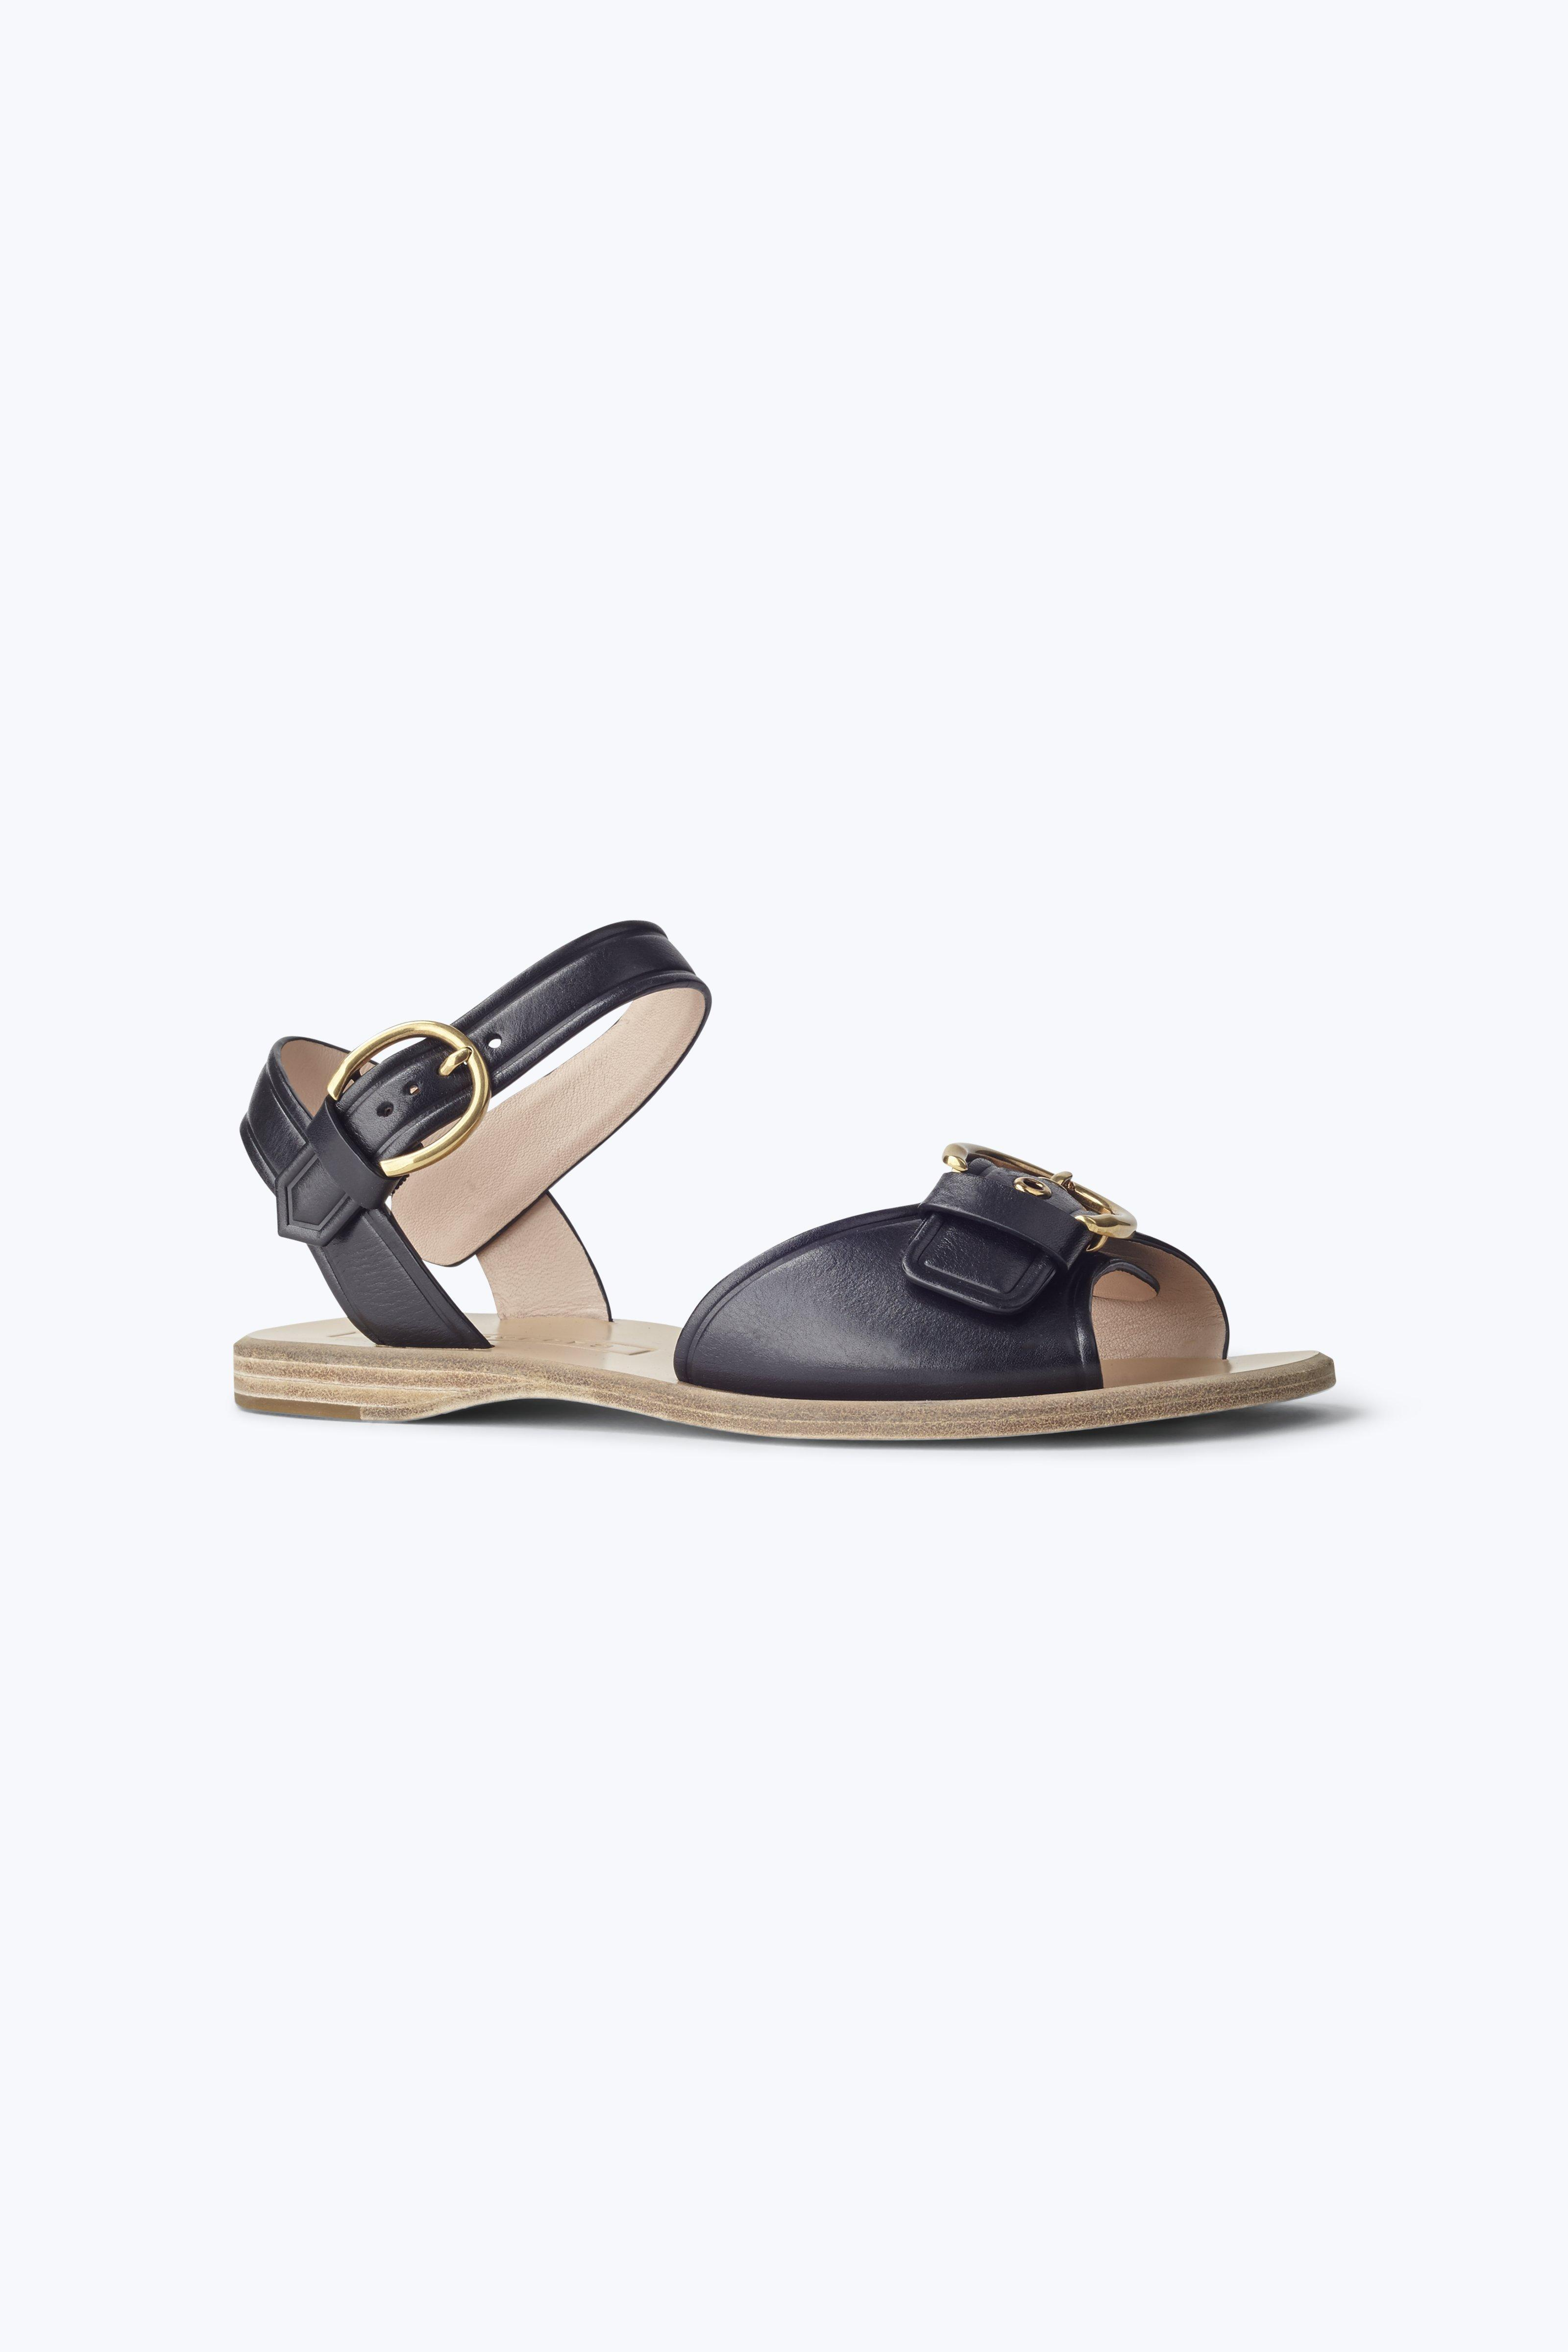 Marc Jacobs Horizon Flat Sandal In Black